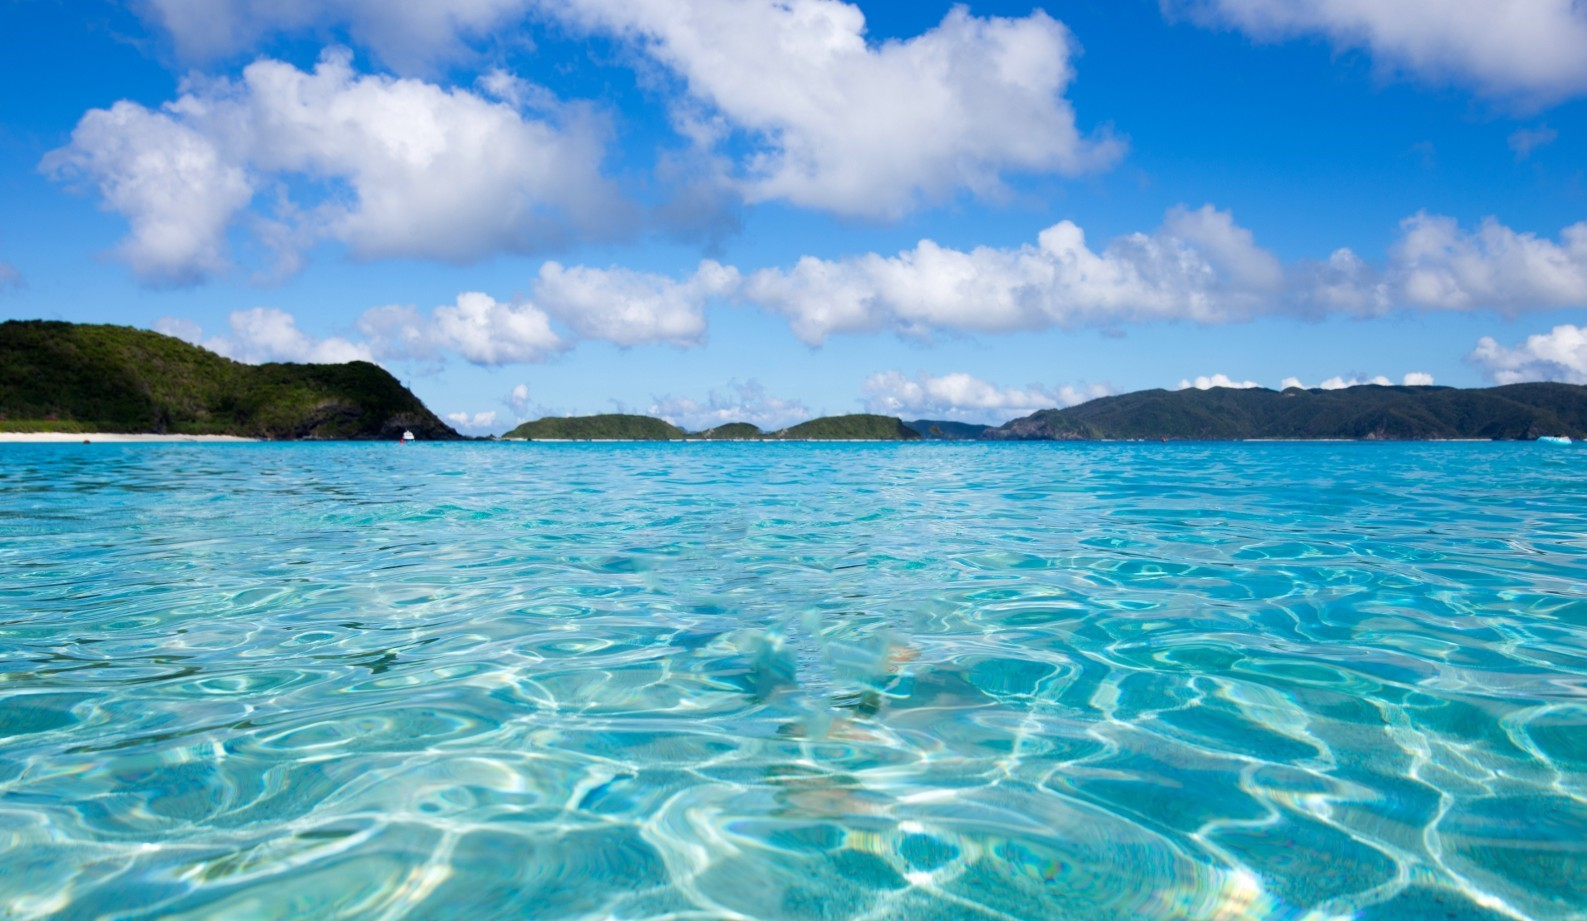 Crystal clear water around Zamami Island